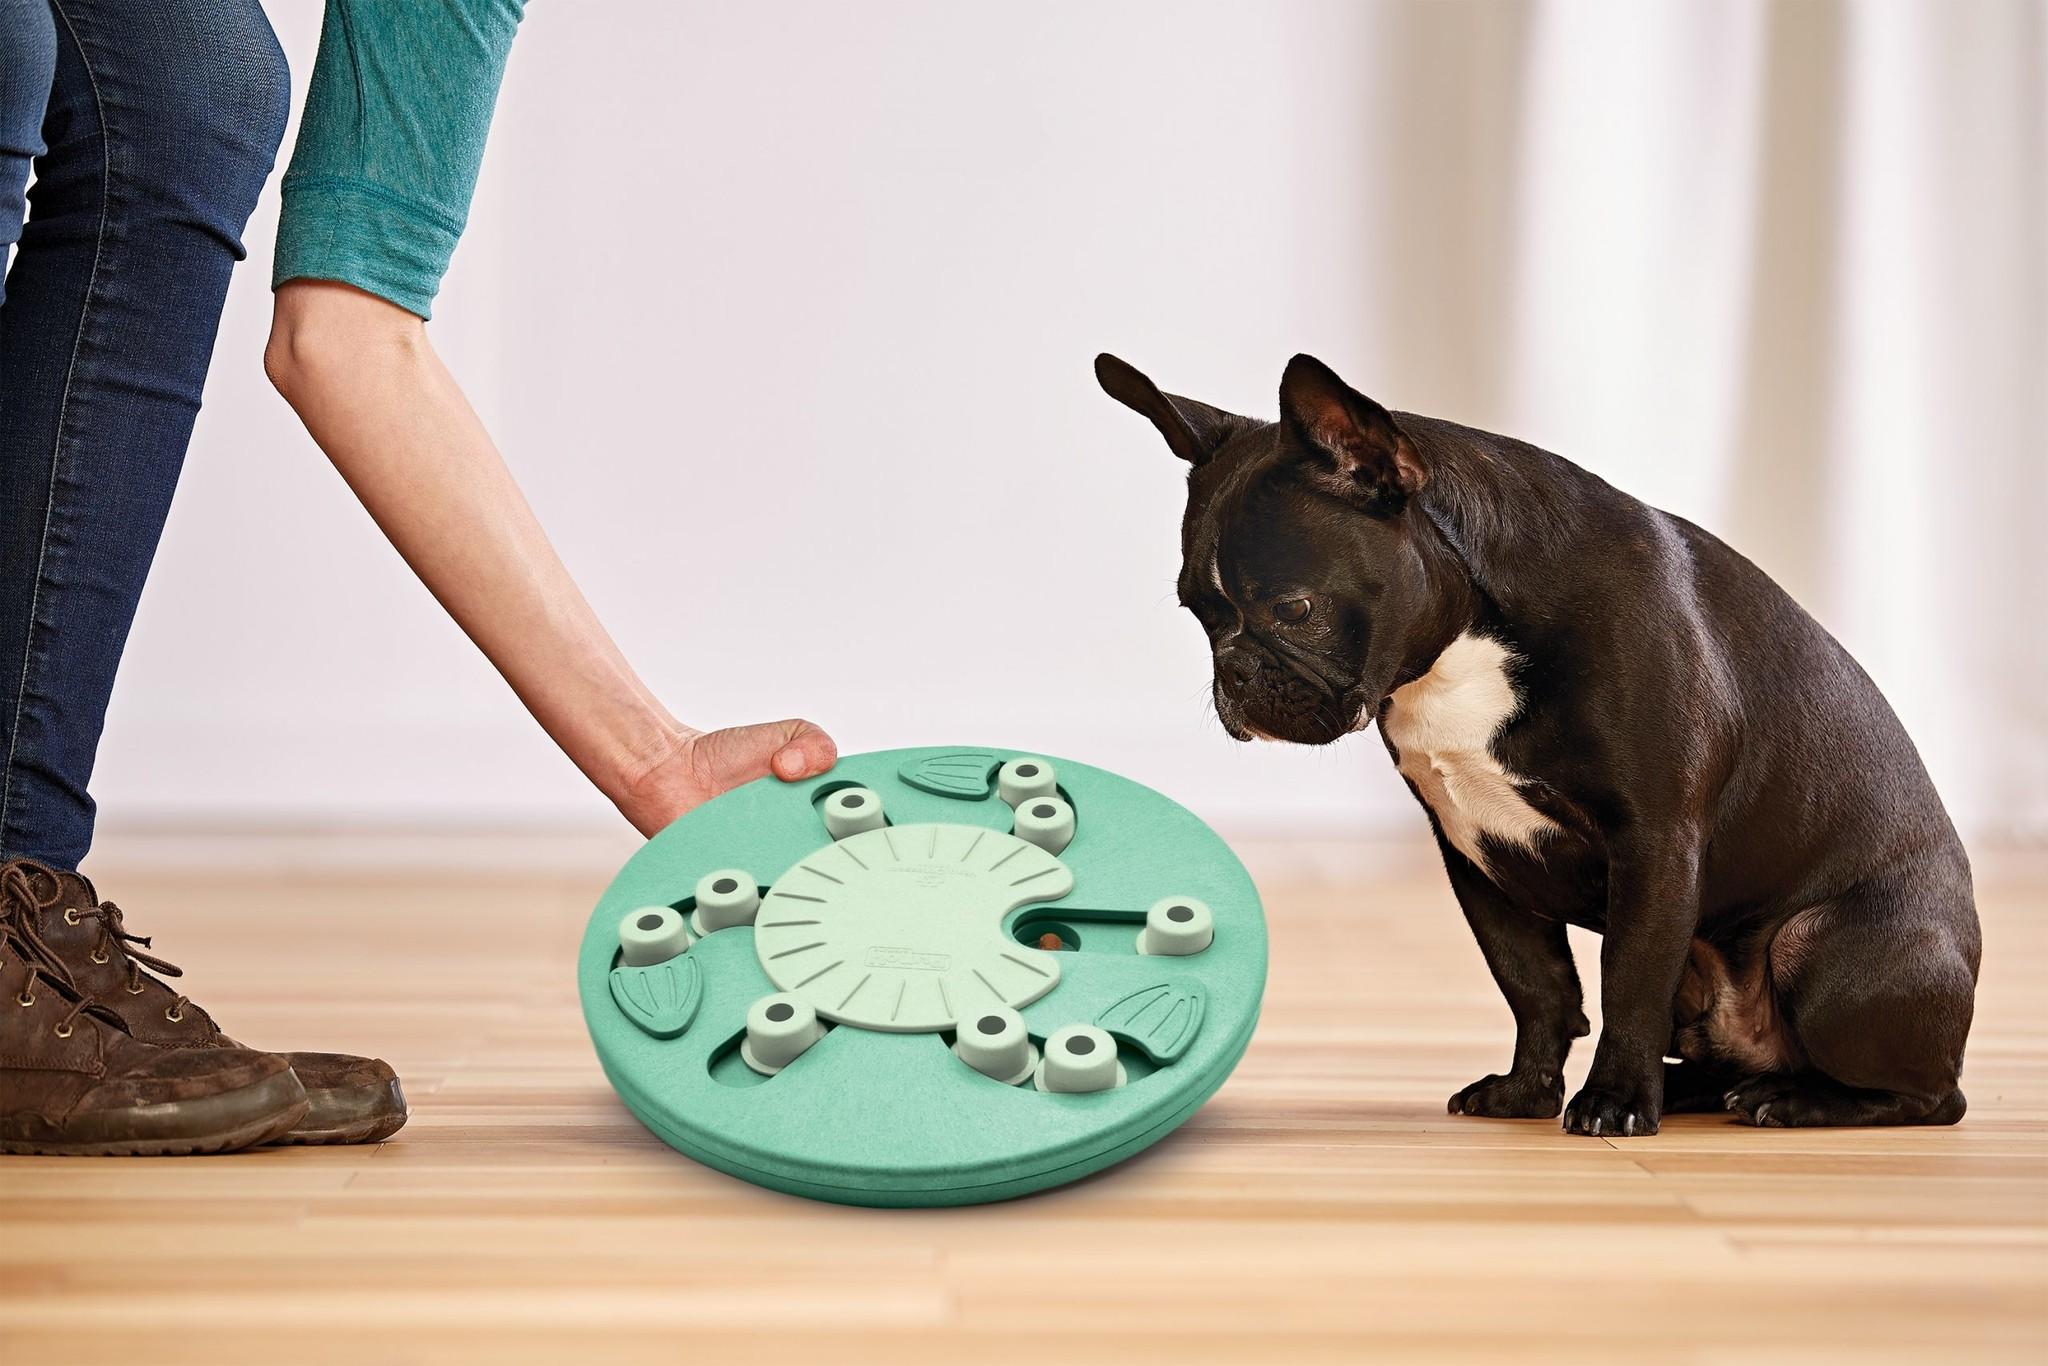 Dog Worker Composite